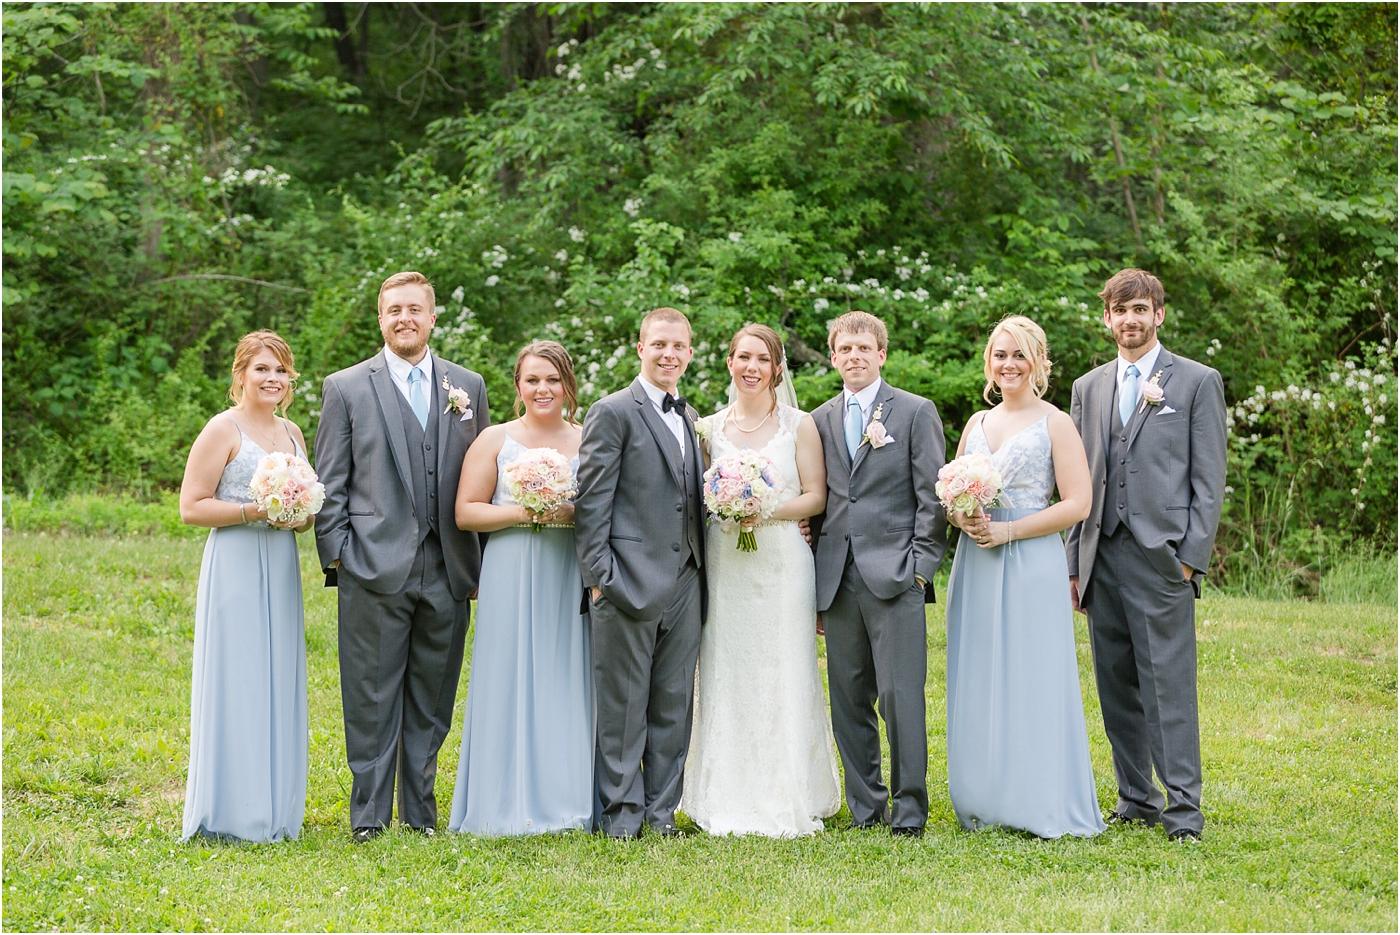 Gettysburg-lodges-wedding-photos-63.jpg